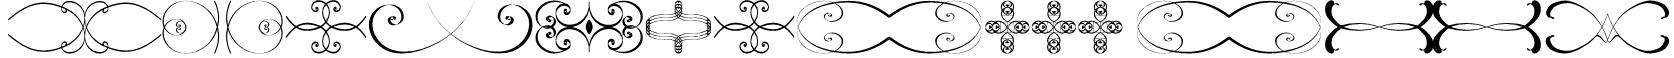 Ornamentsss tfb Font